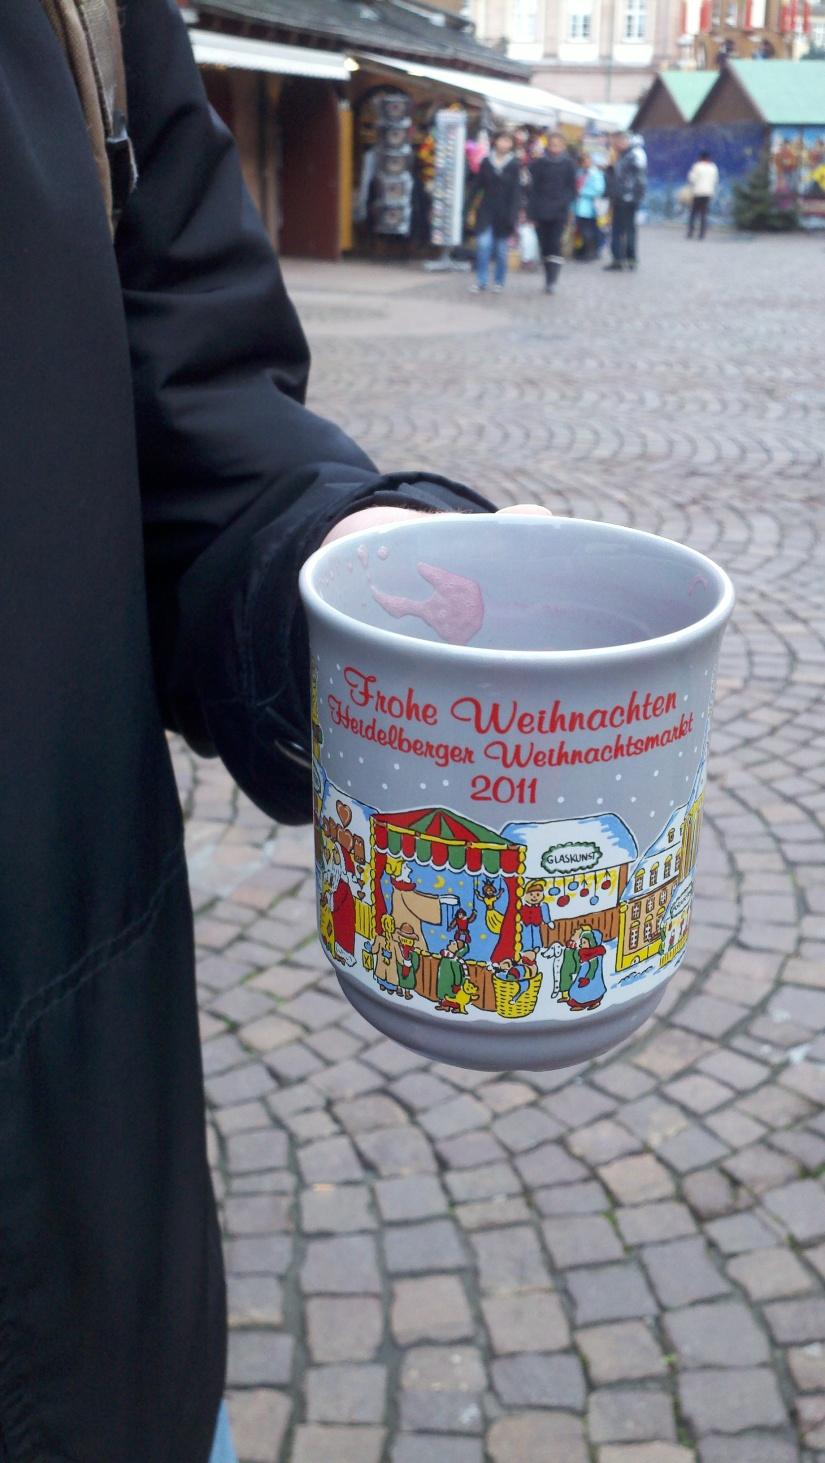 The mug from our first Glühwein at the Heidelberg Weihnachtsmarkt (Christmas Market).